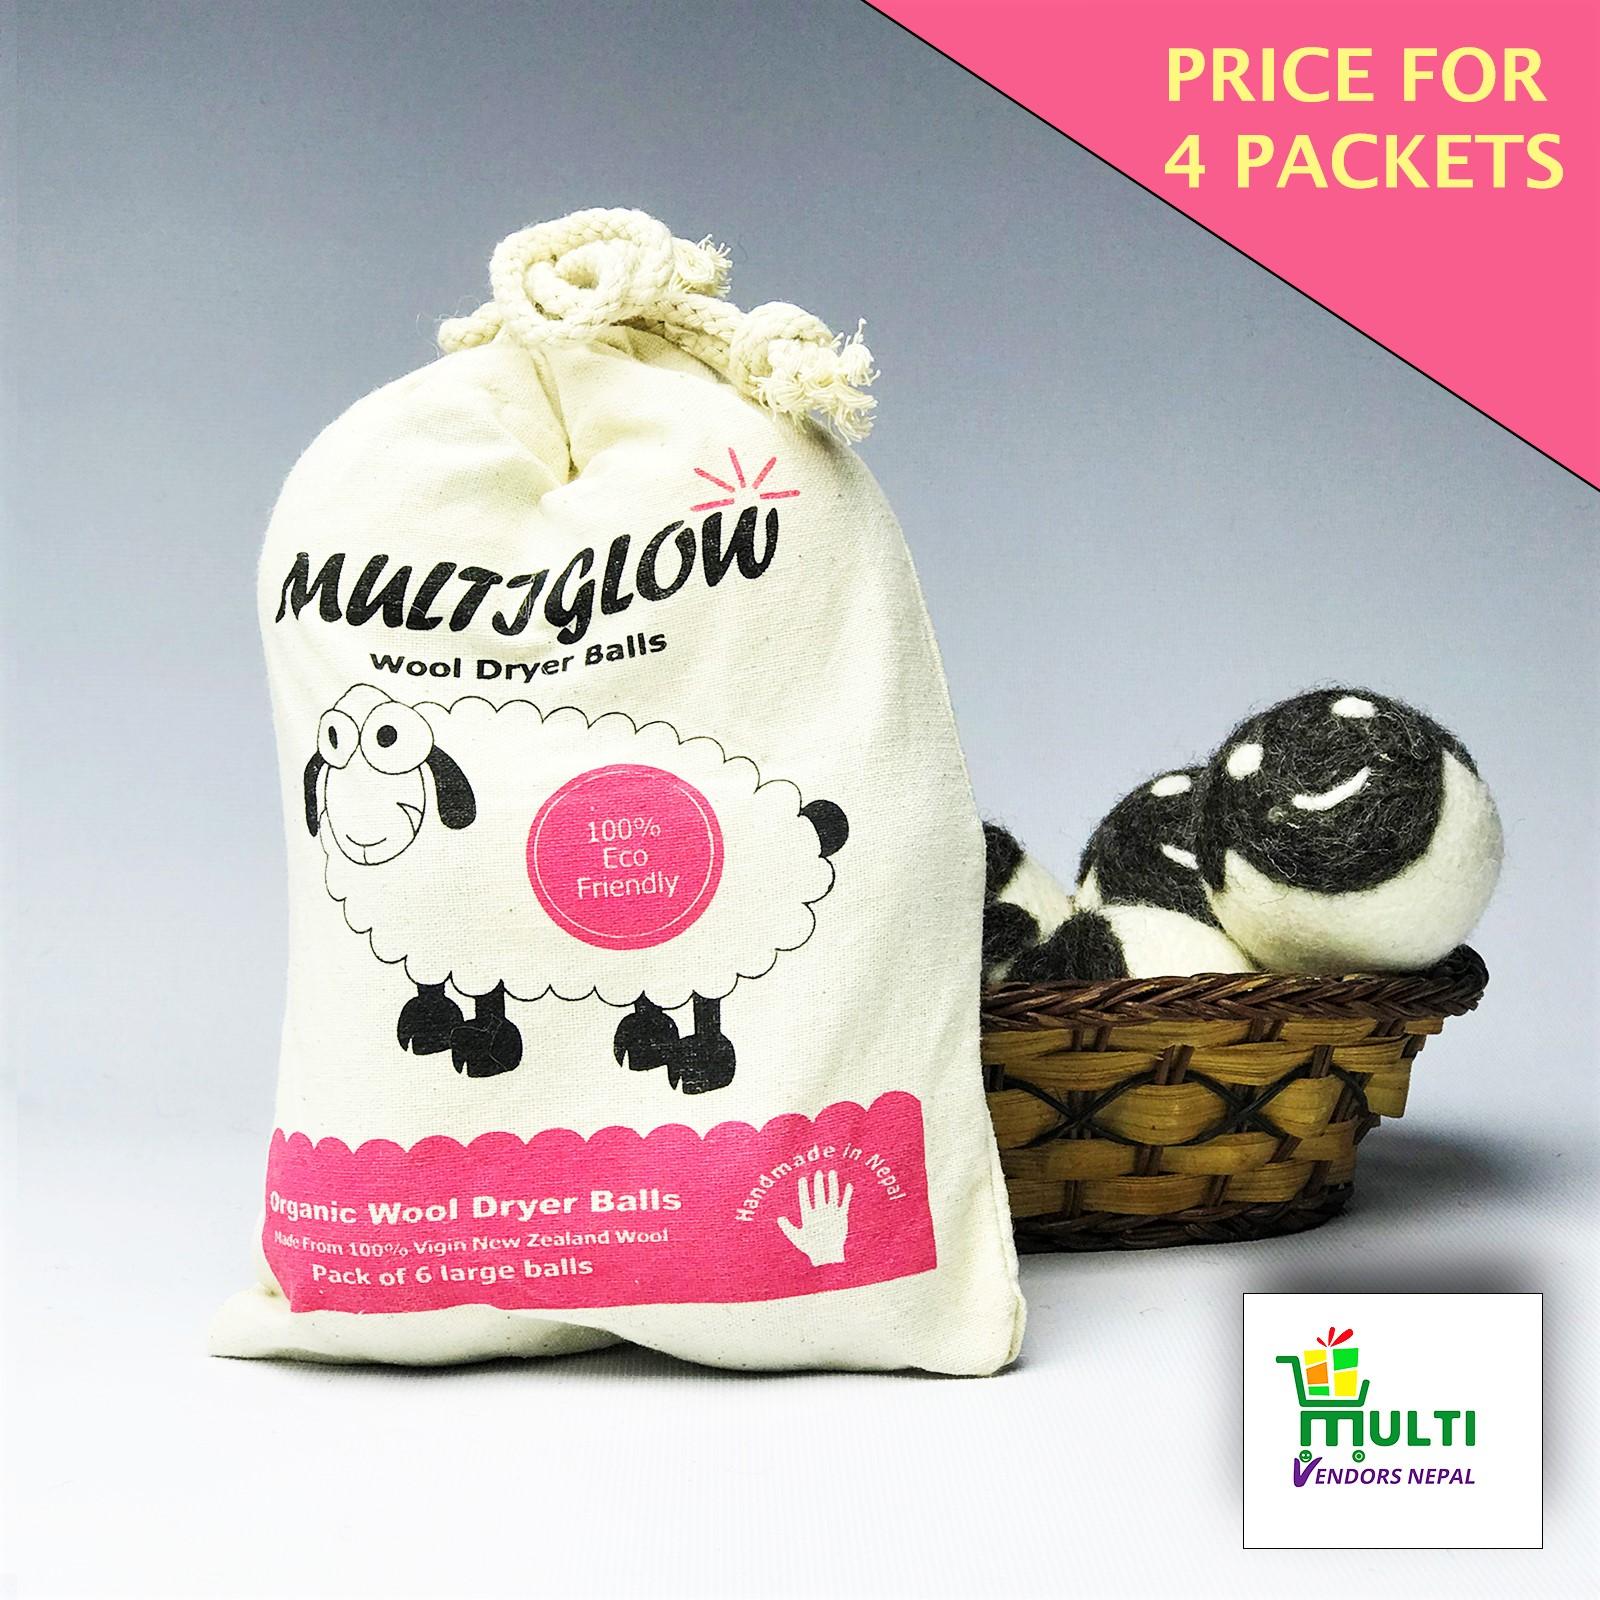 Multiglow Wool Dryer Balls- 4 Pack